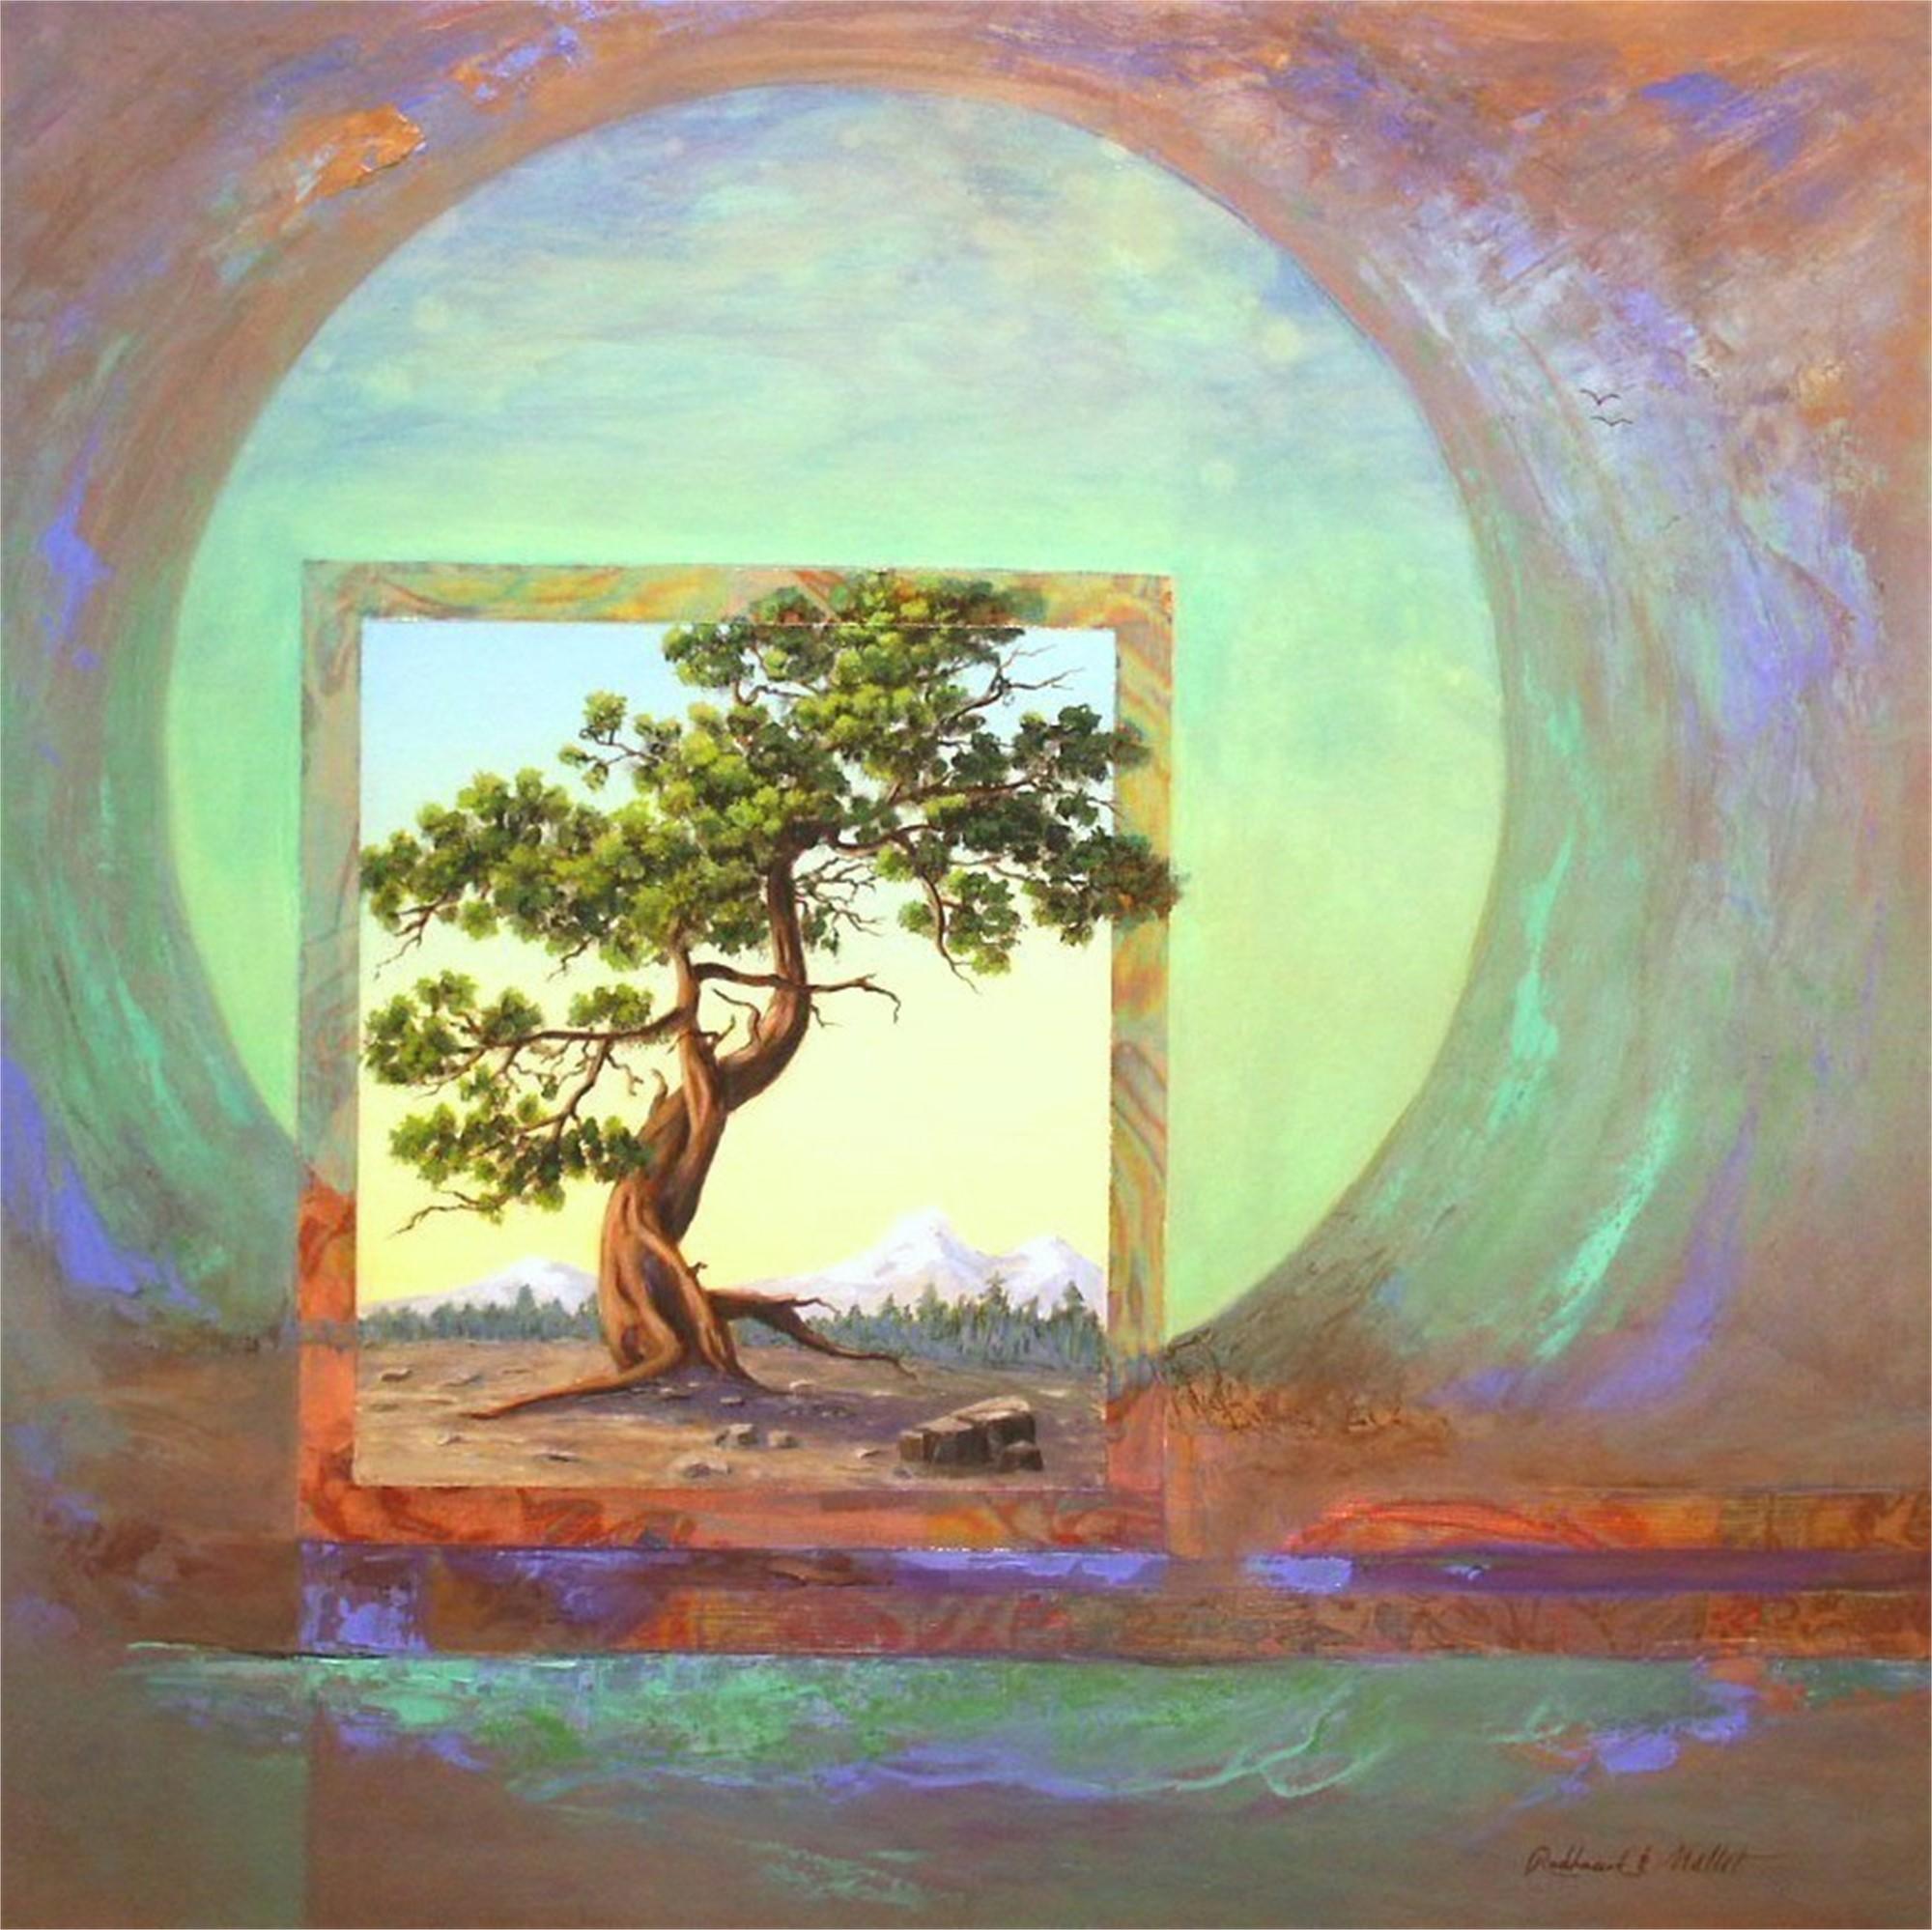 Bristlecone Pine+Moon#111 by Marlys Mallét & Michael Redhawk